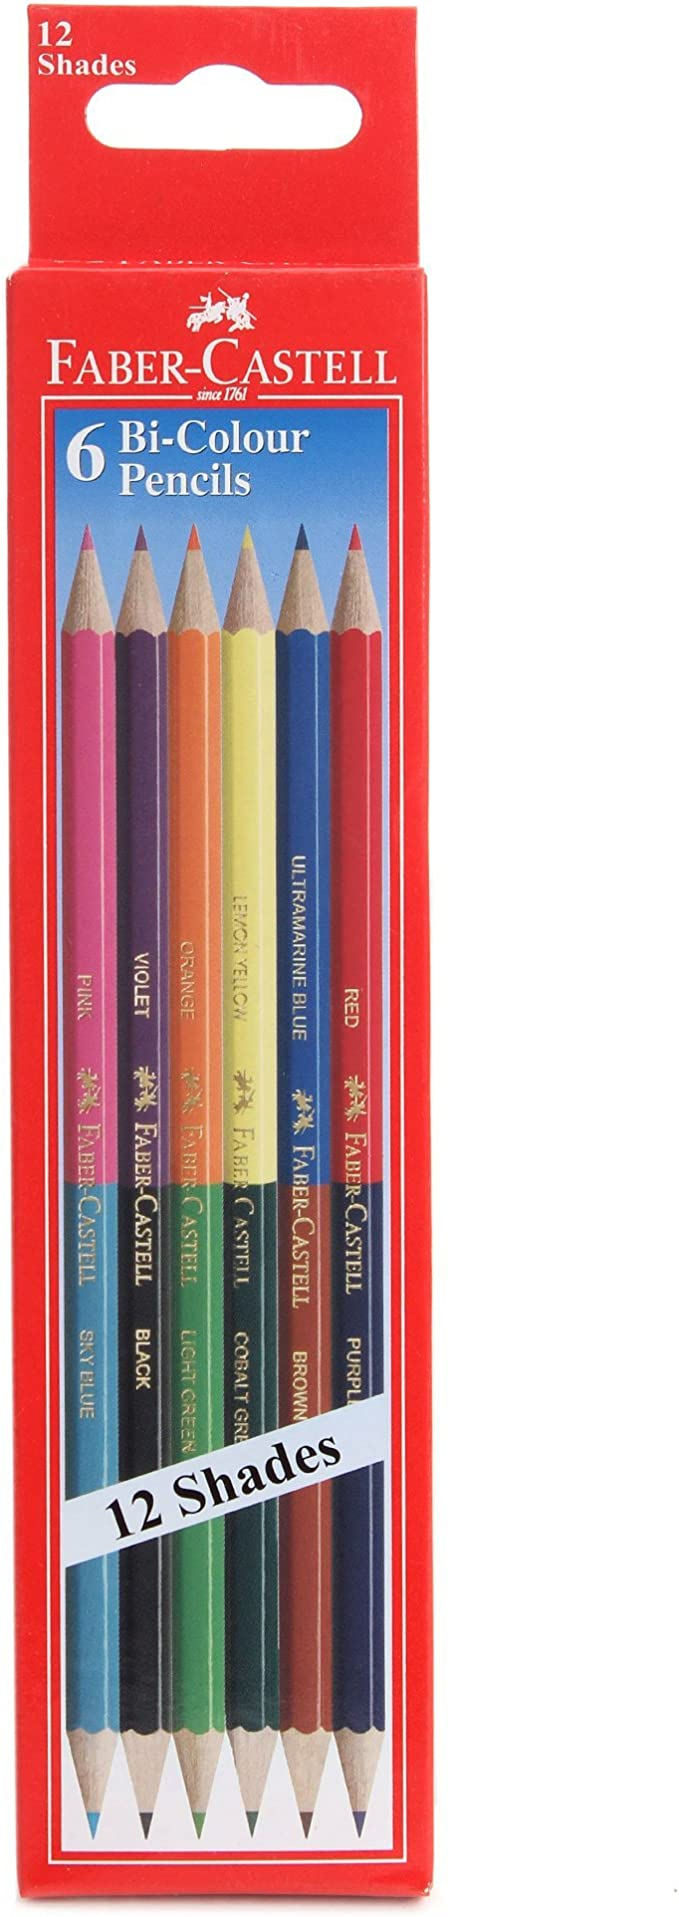 Set of 18 Faber castell Dual Sided Bi Colour Pencils in Hexagonal Shape